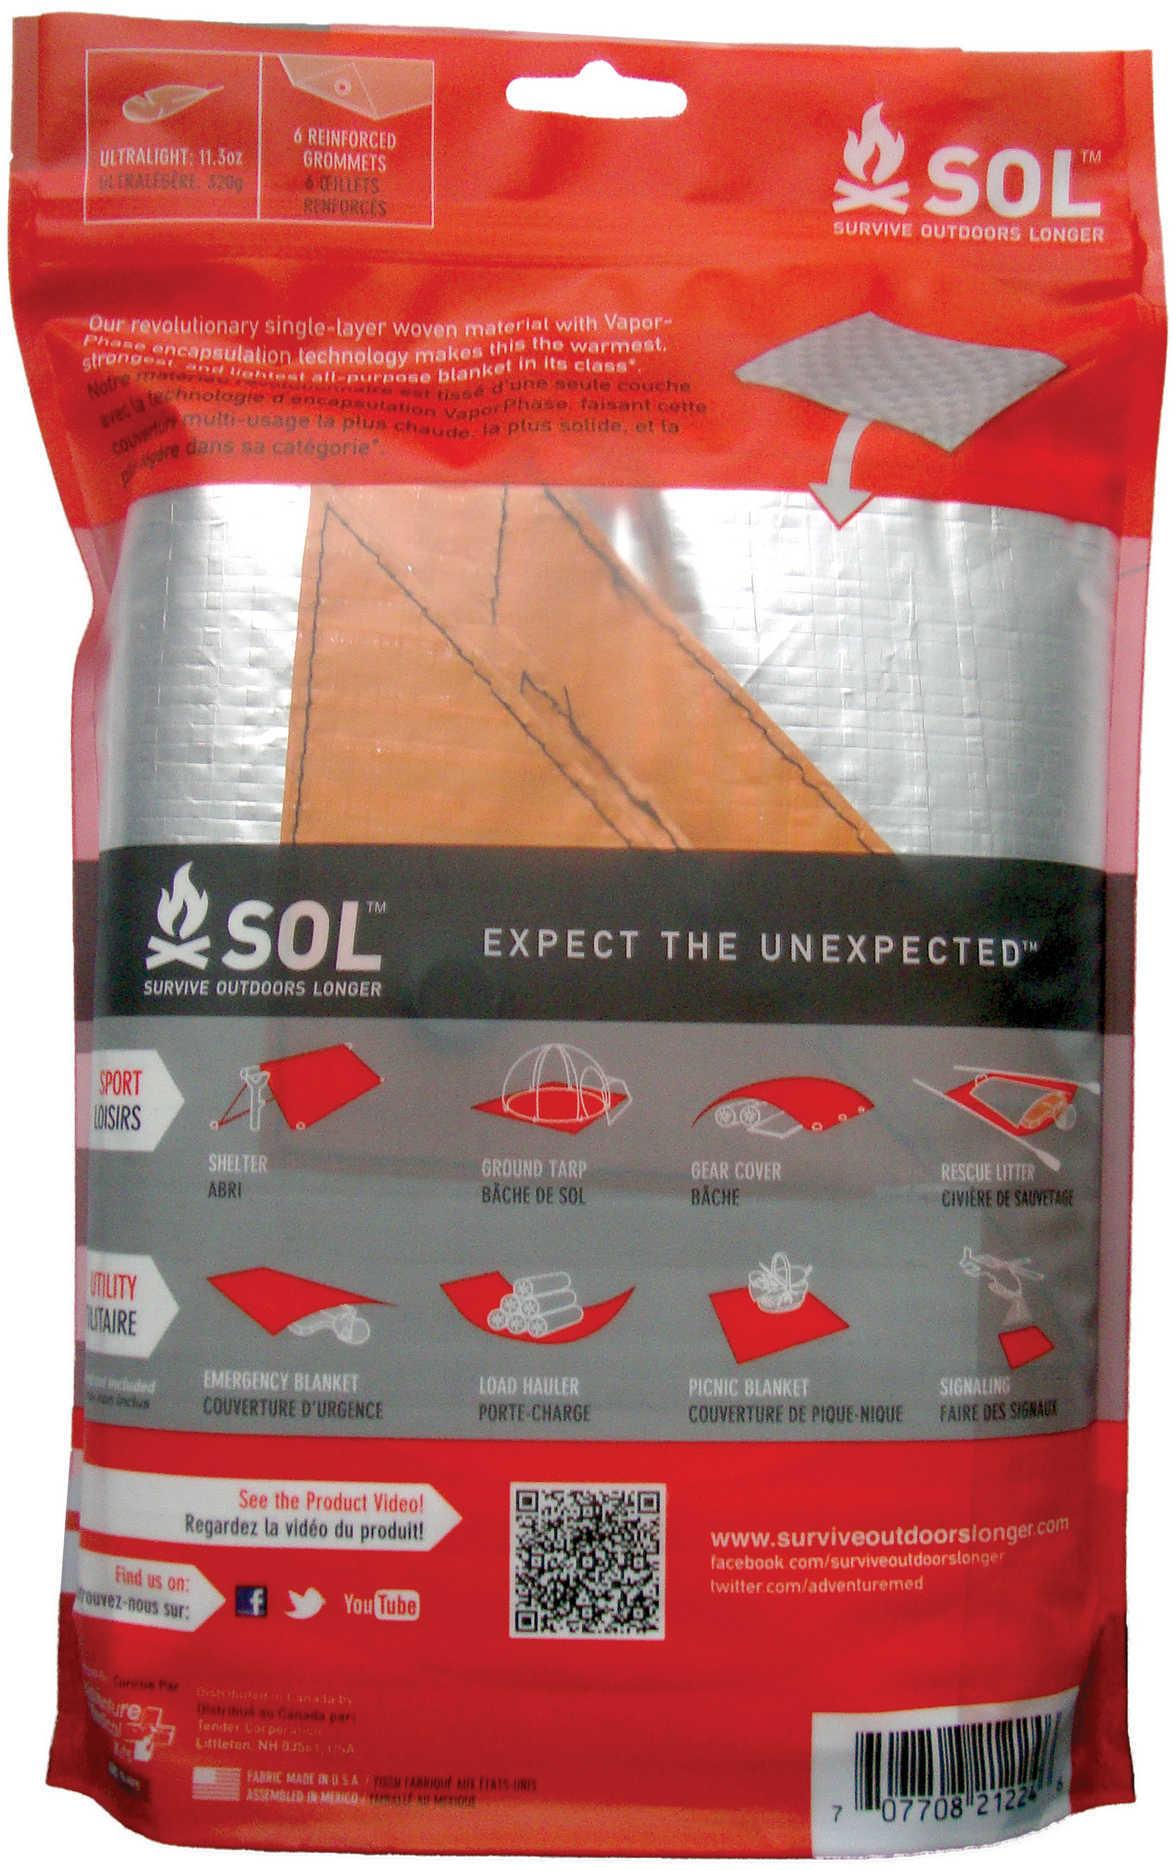 Sol Series Sport Utility Blanket Md: 0140-1224